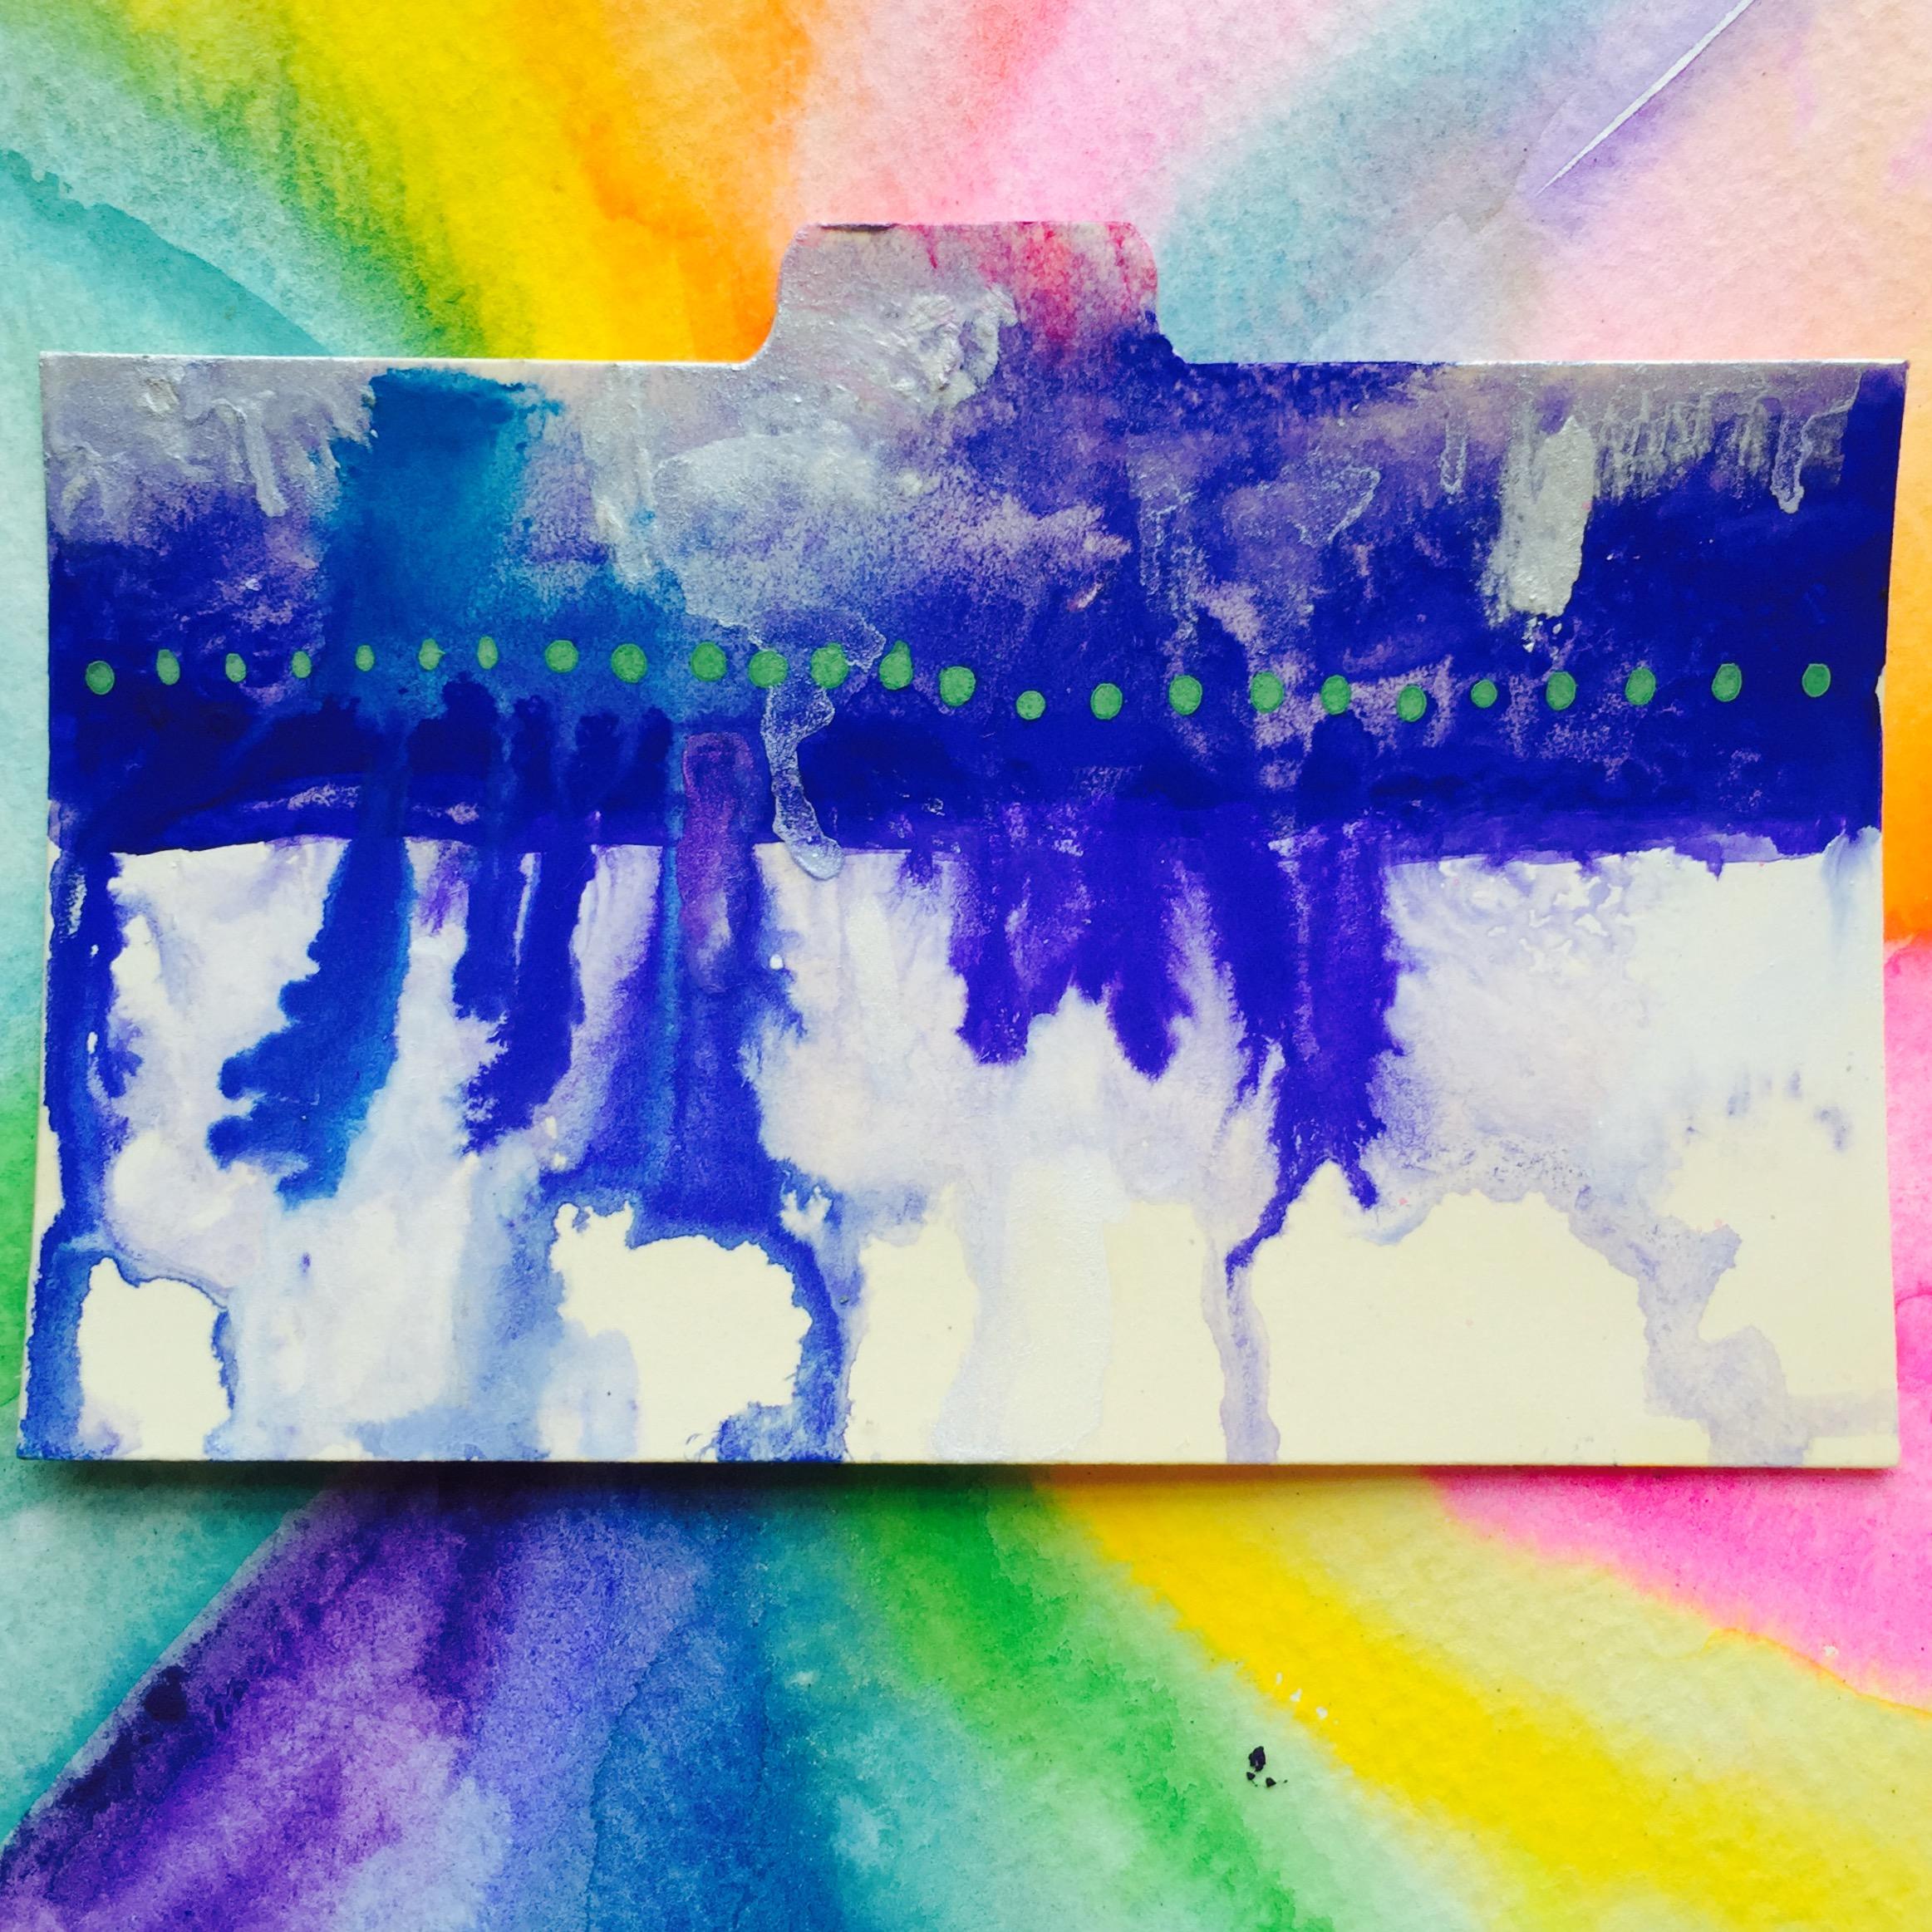 "3x5"" index card, gouache. Artwork by Tammy Garcia."